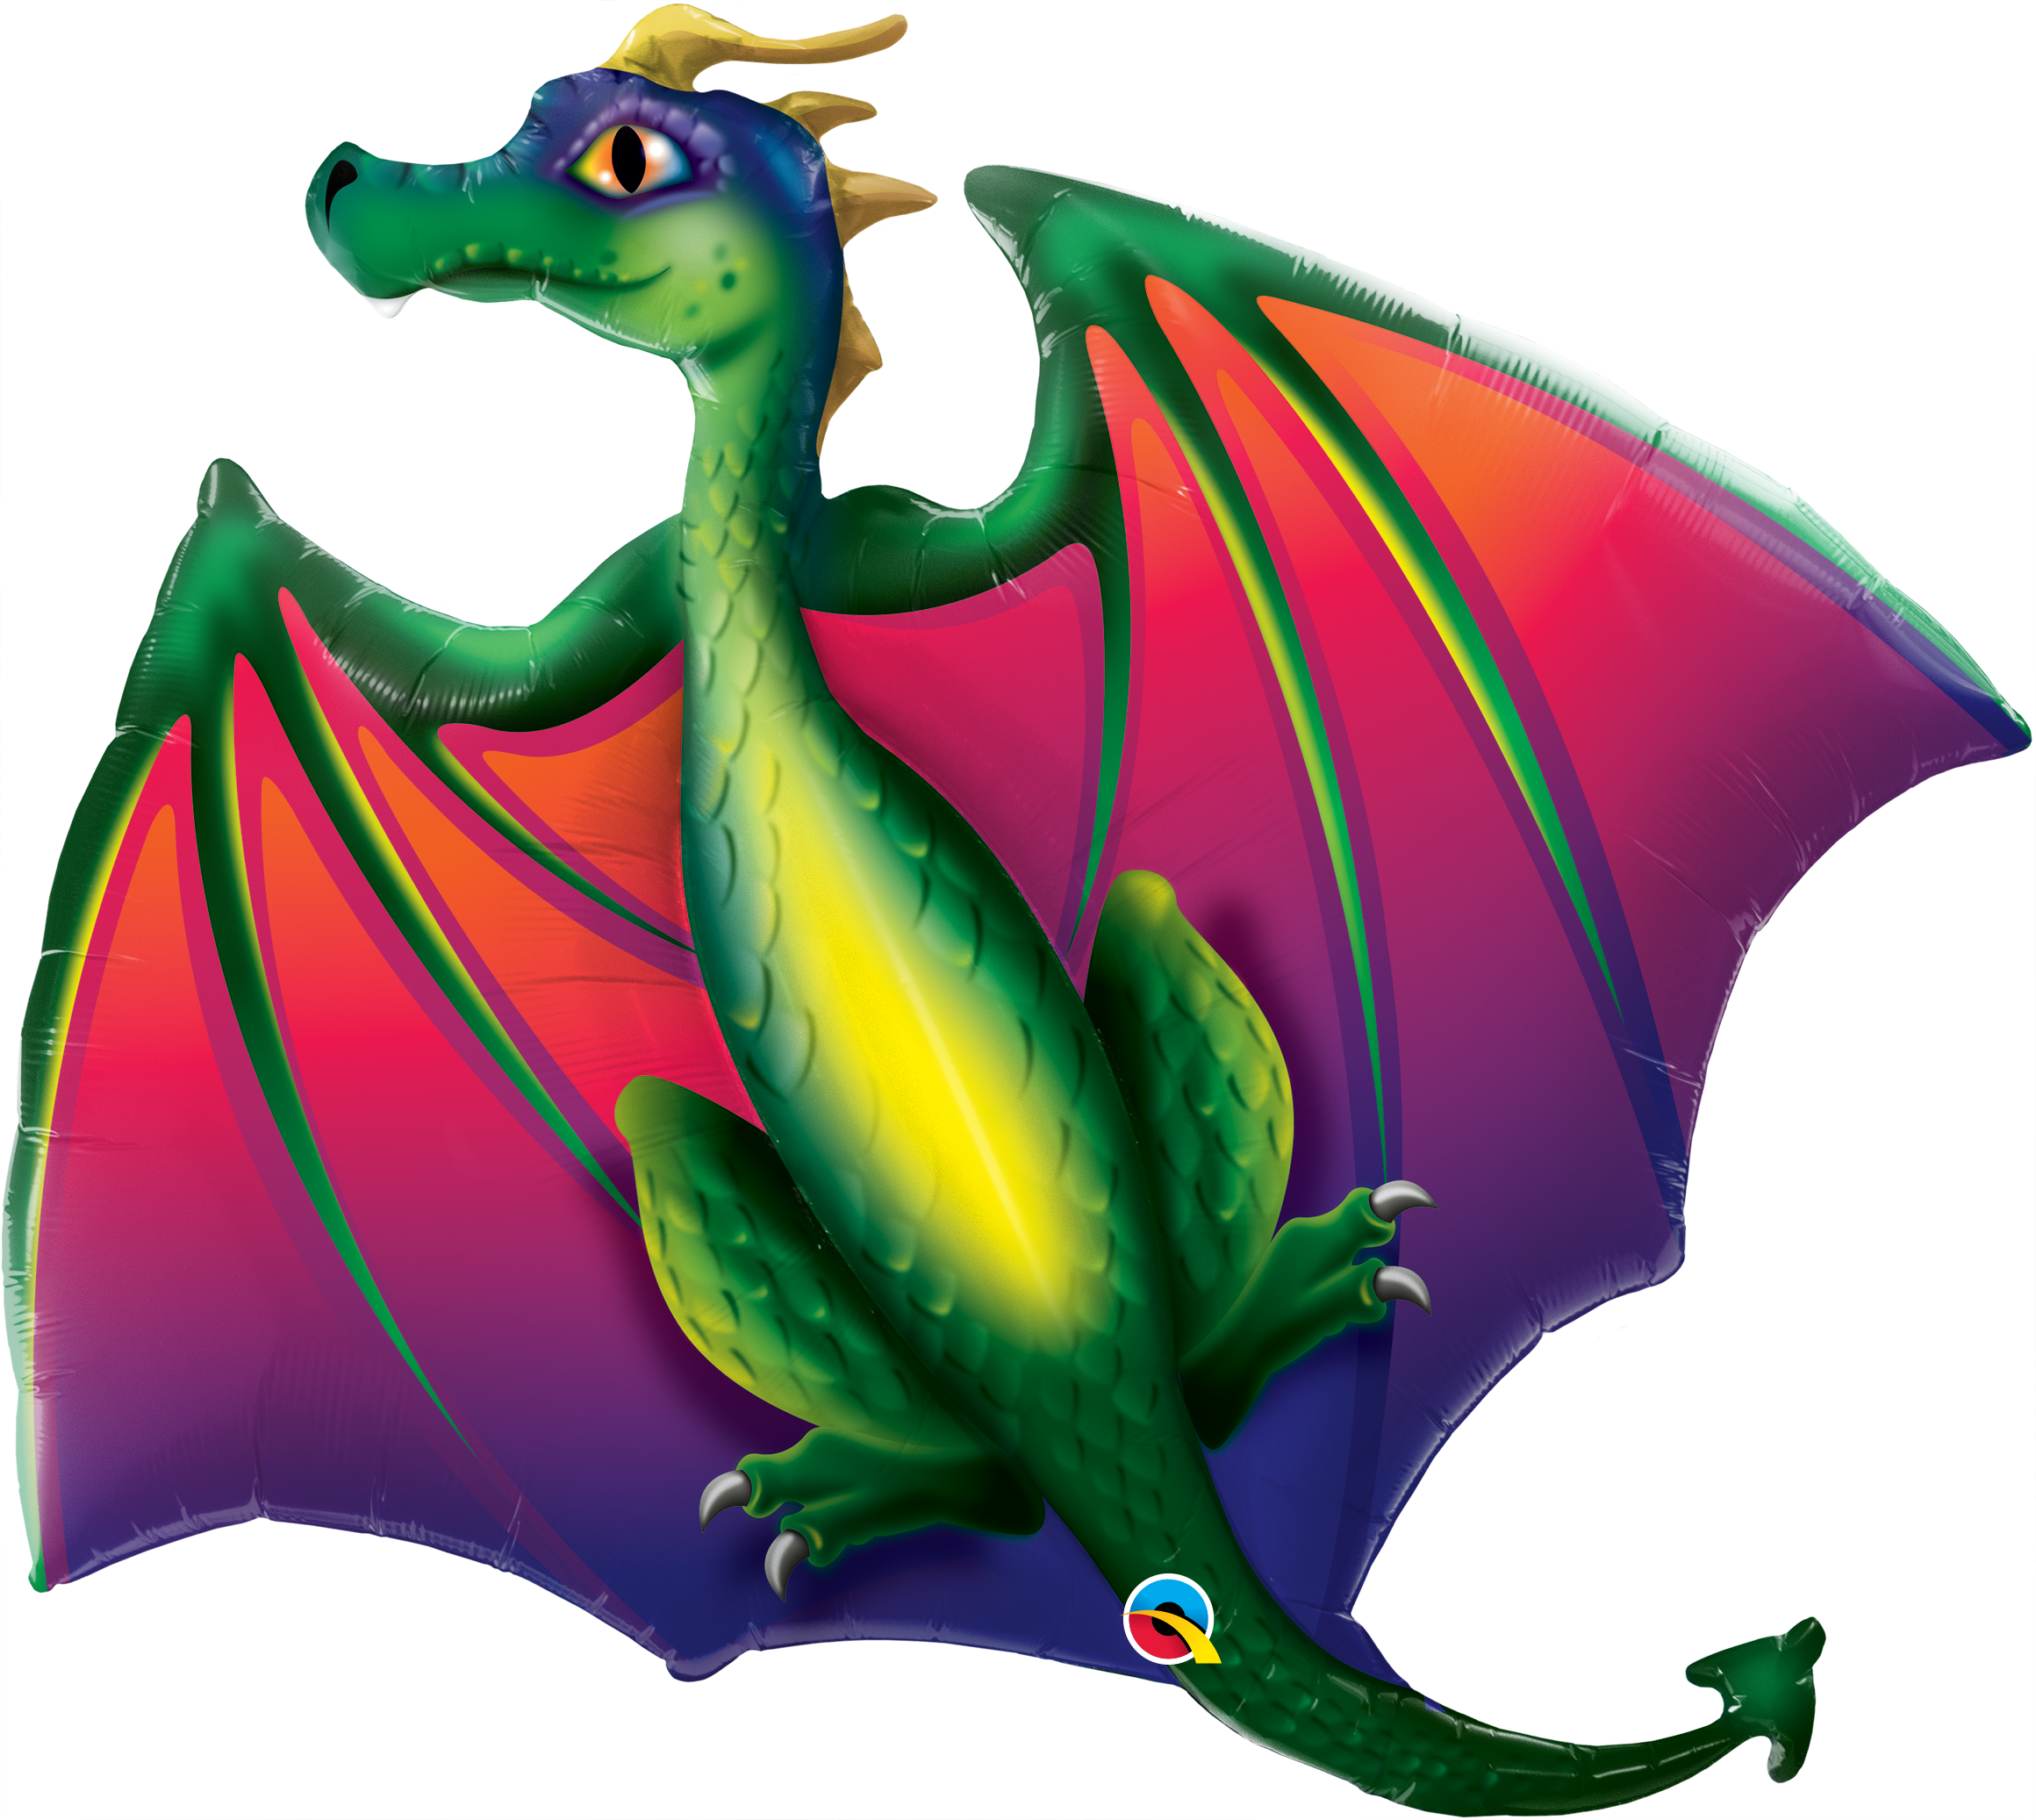 Supershape Mythical Dragon - 63879